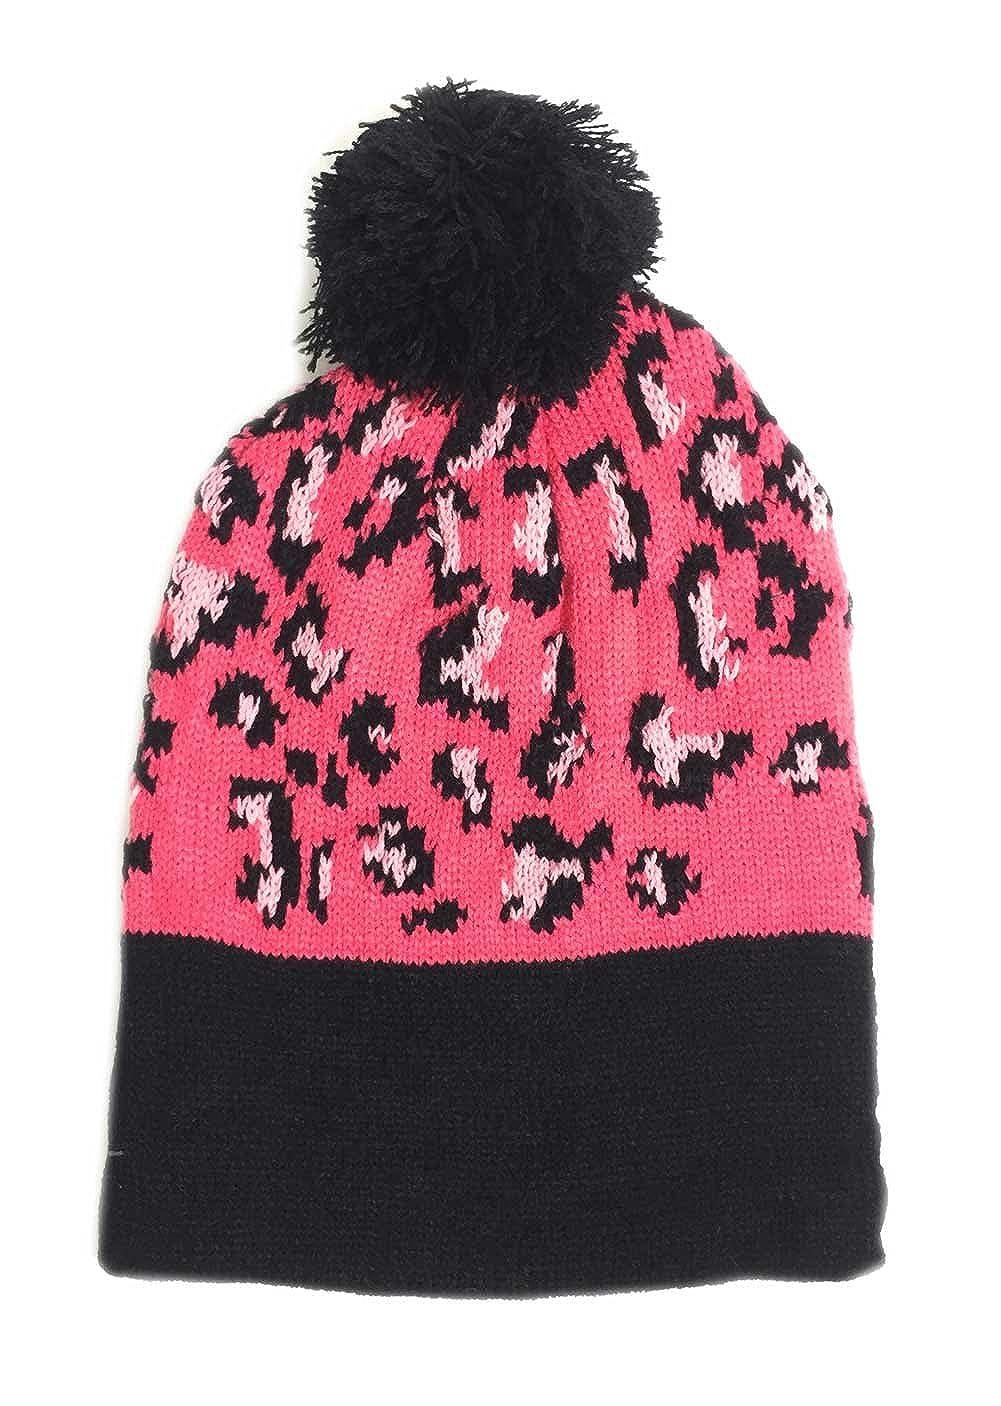 49d91a657cbe37 Amazon.com: Aesthetinc Classic Leopard Print Knit Pom Pom Beanie Hat  (Ivory): Clothing